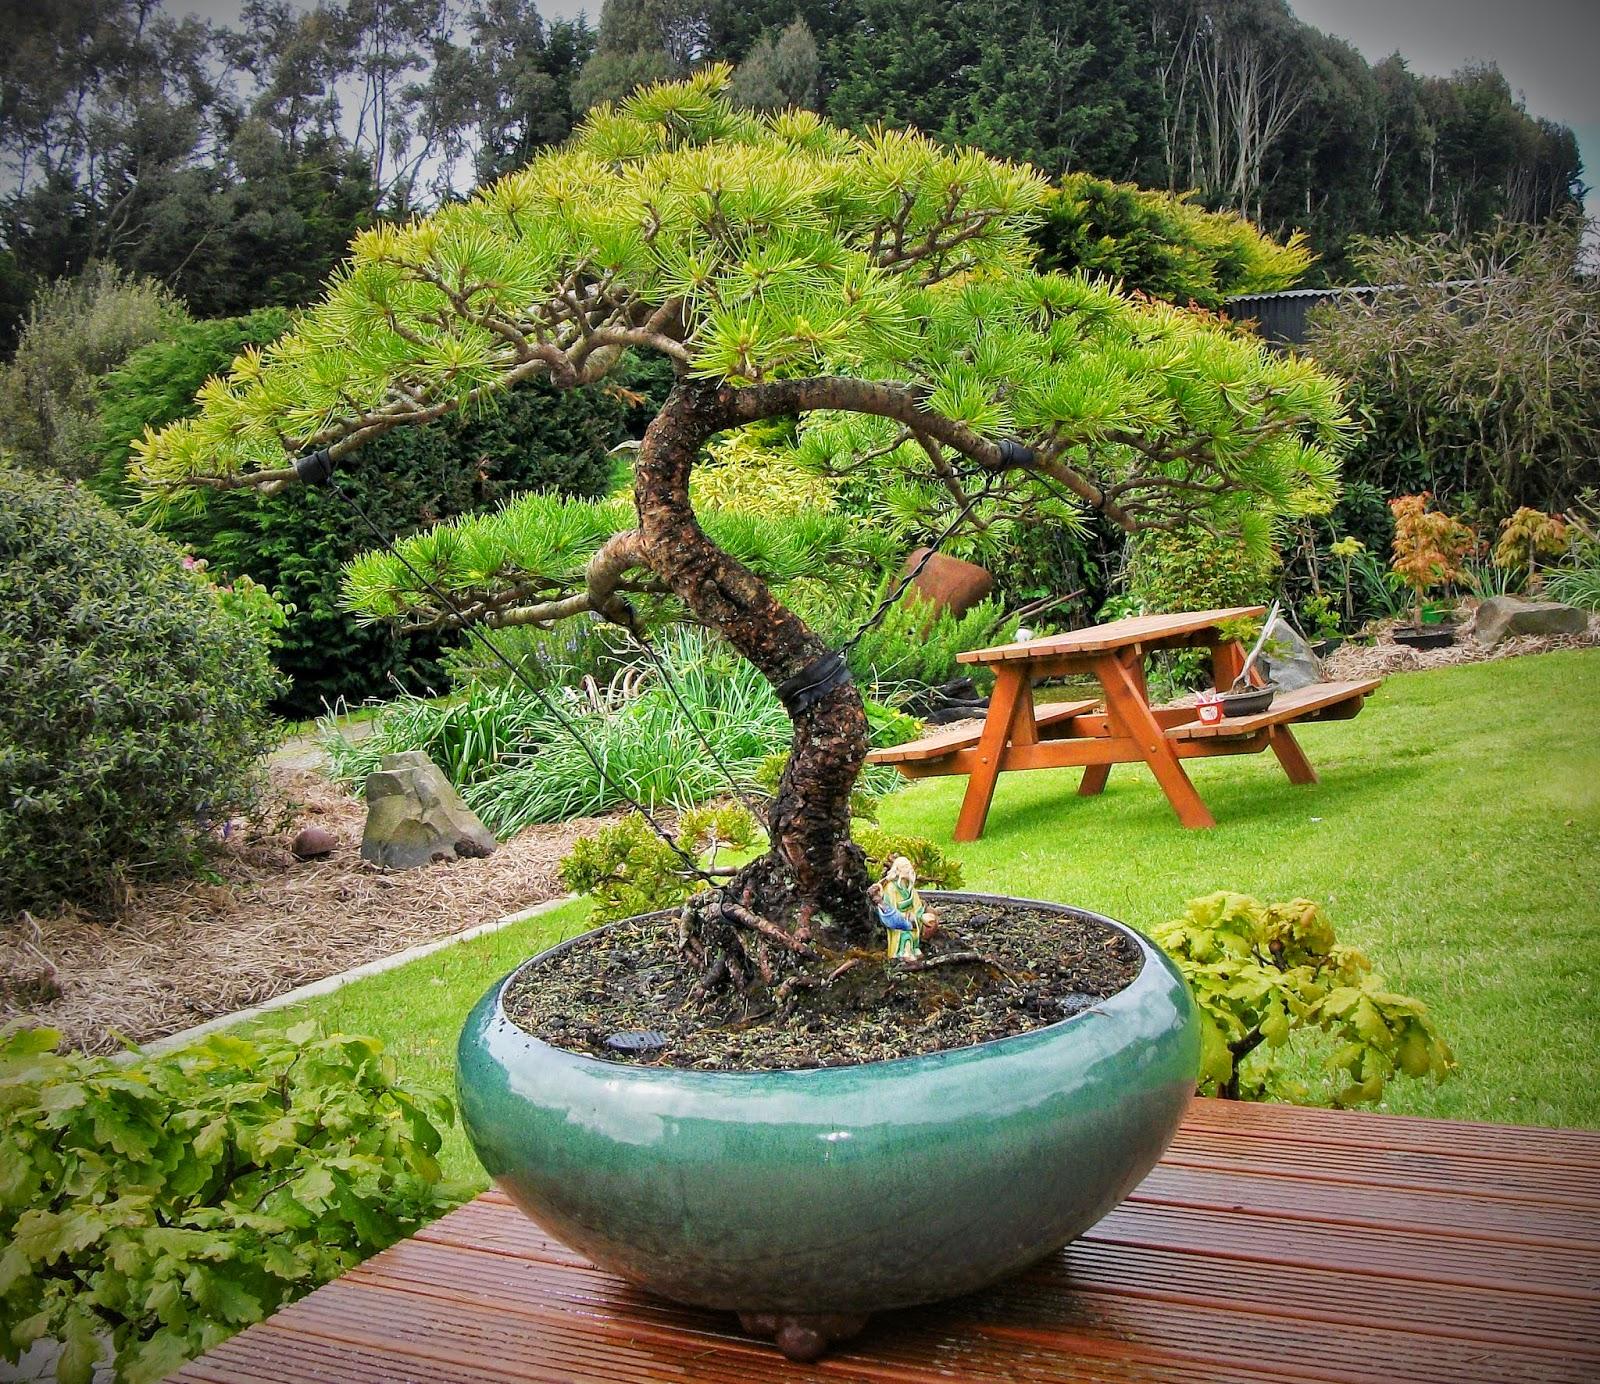 fionnas bonsai pots kiwi made in new zealand my golden